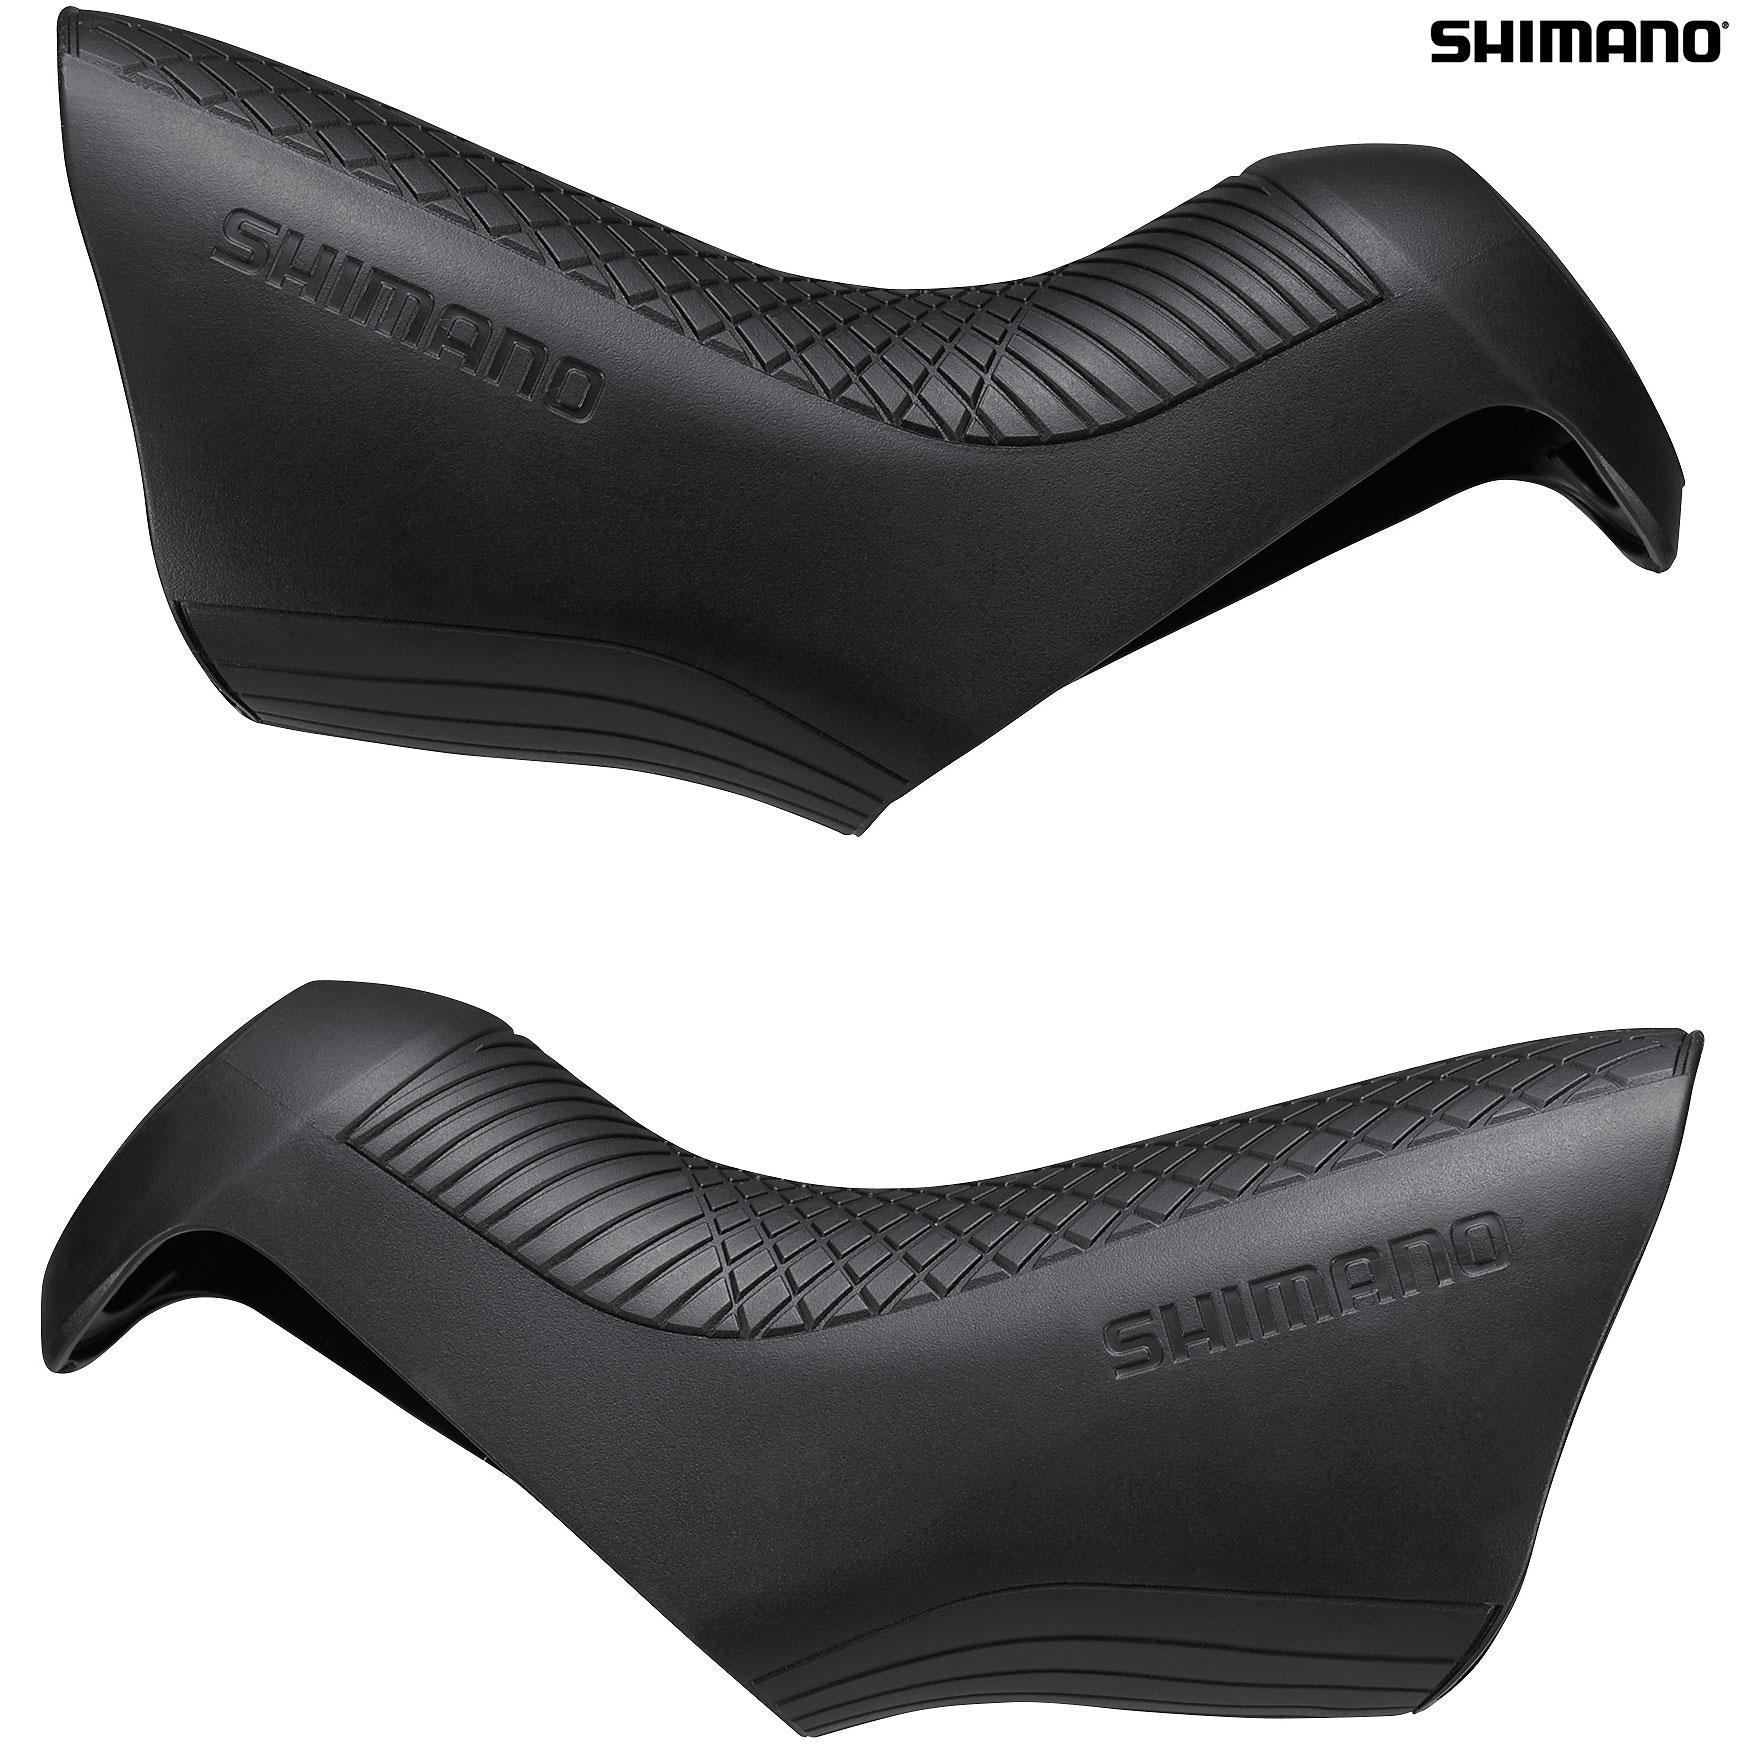 Shimano Ultegra Di2 ST-R8050 Bracket STI Covers 1Pair NIB